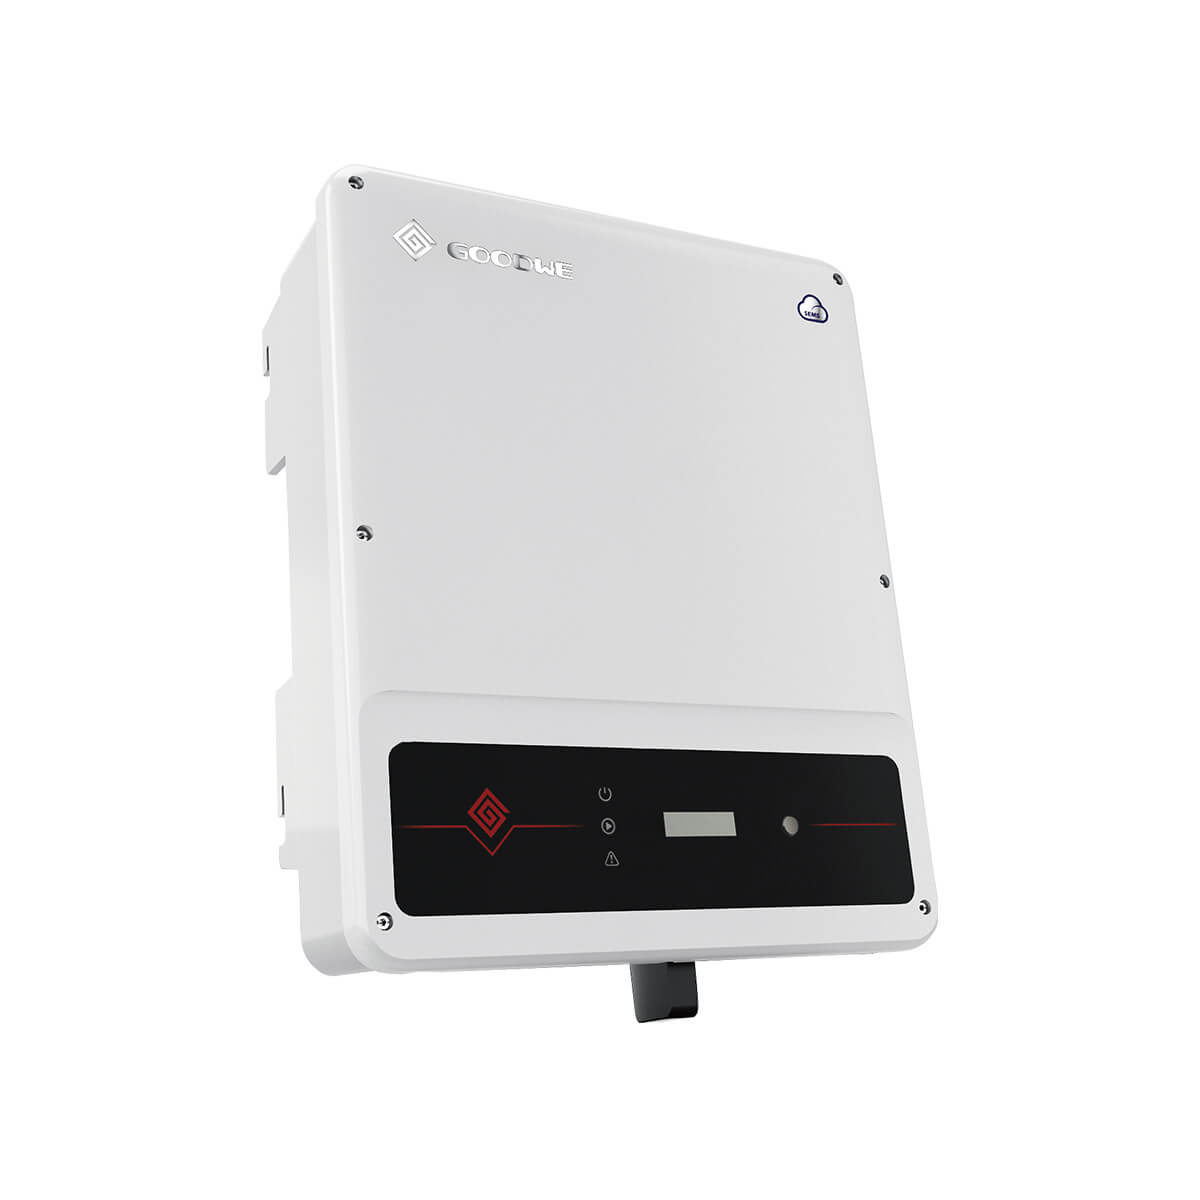 goodwe 8kW inverter, goodwe gw8k-dt 8kW inverter, goodwe gw8k-dt inverter, goodwe gw8k-dt, goodwe 8 kW